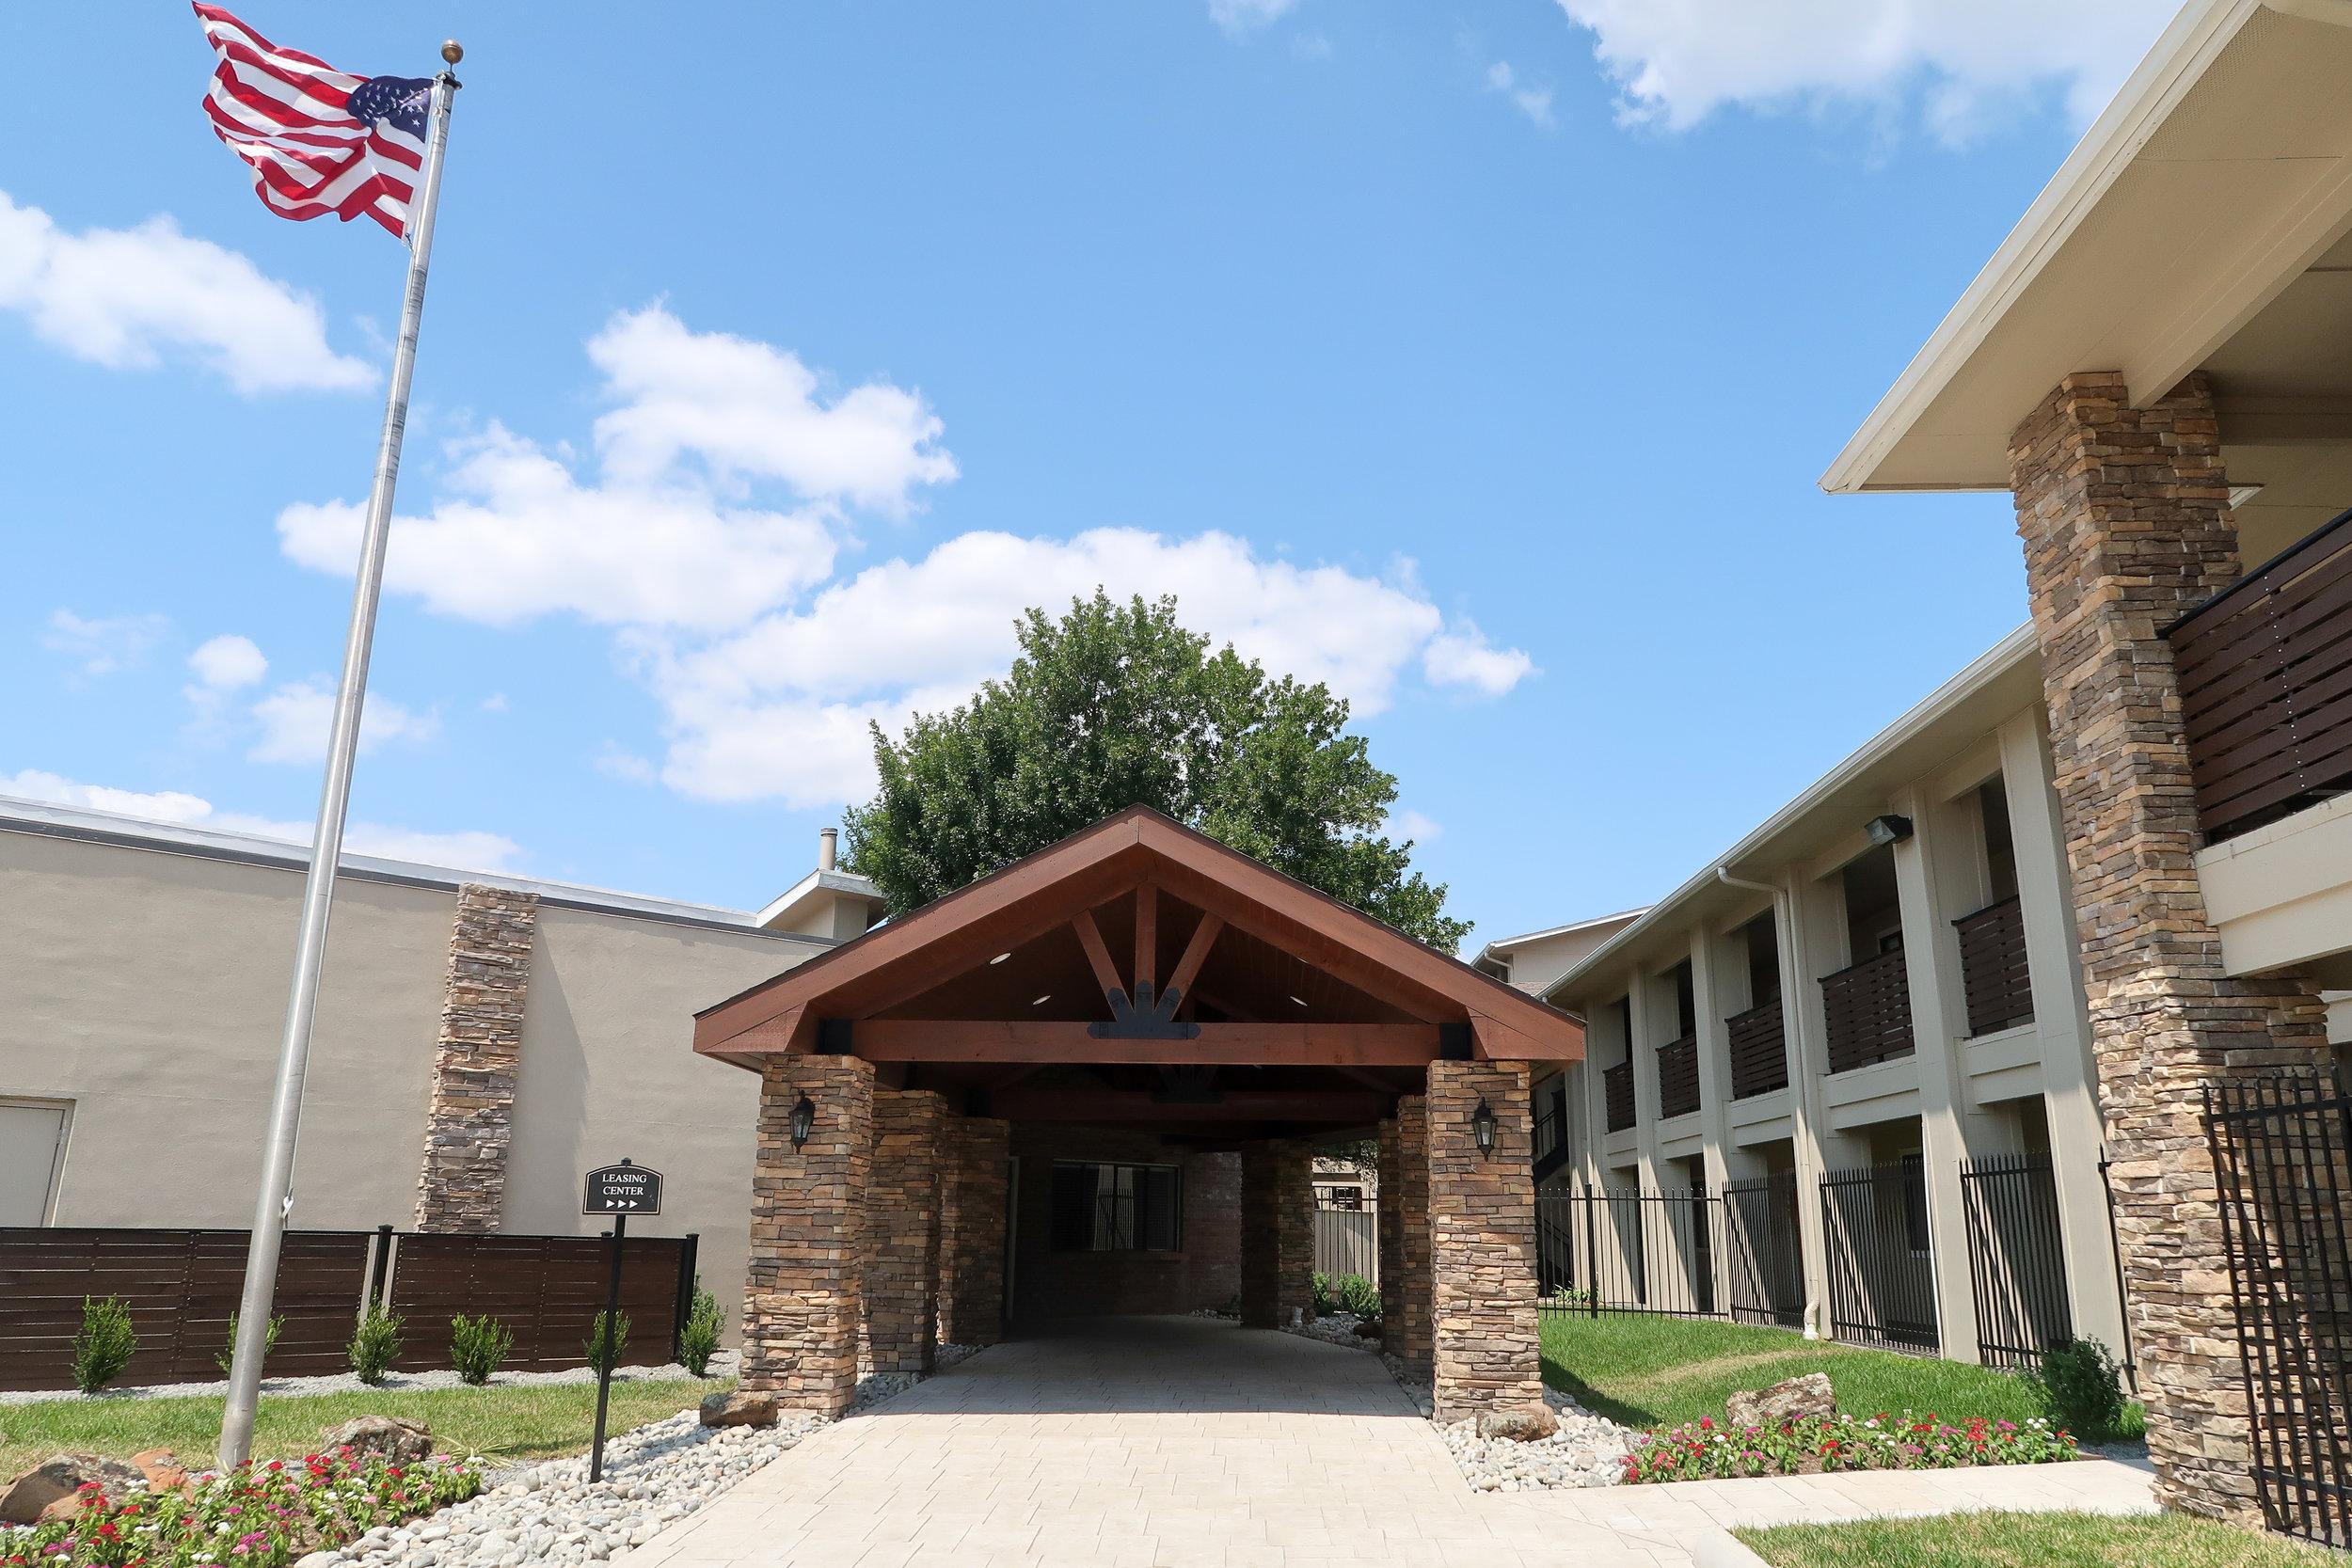 Montclair Estates Garland Texas Front Entrance with Flag